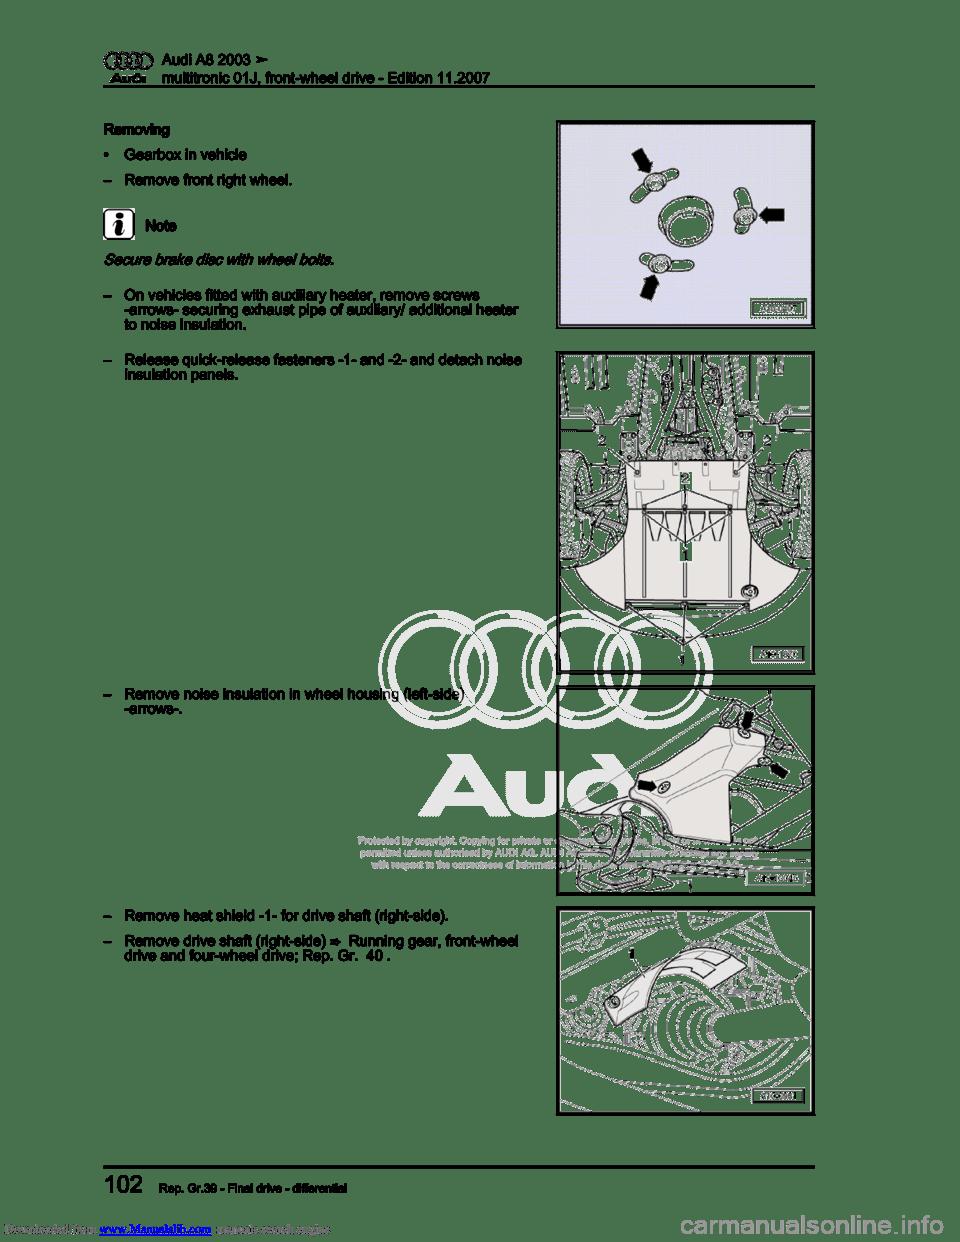 AUDI A8 2003 D3 / 2.G Multitronic System Workshop Manual